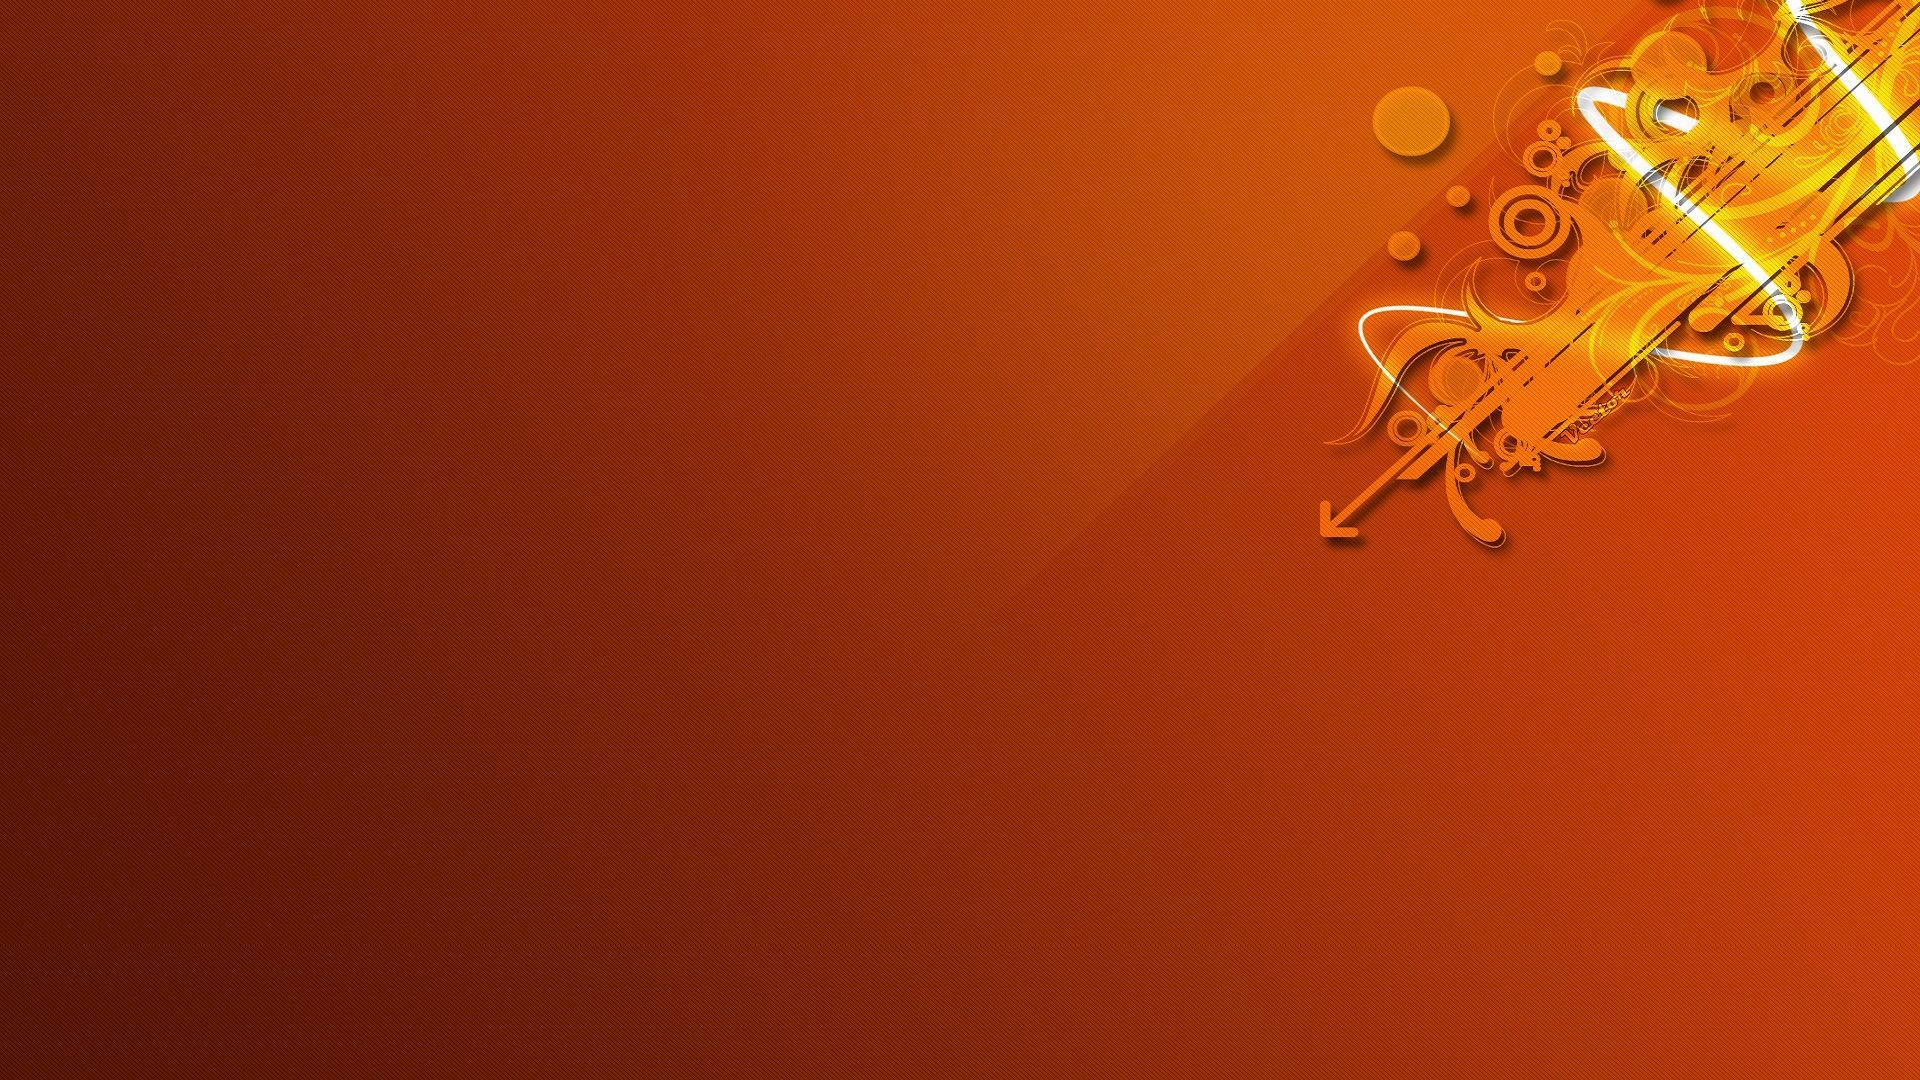 Orange desktop wallpaper download